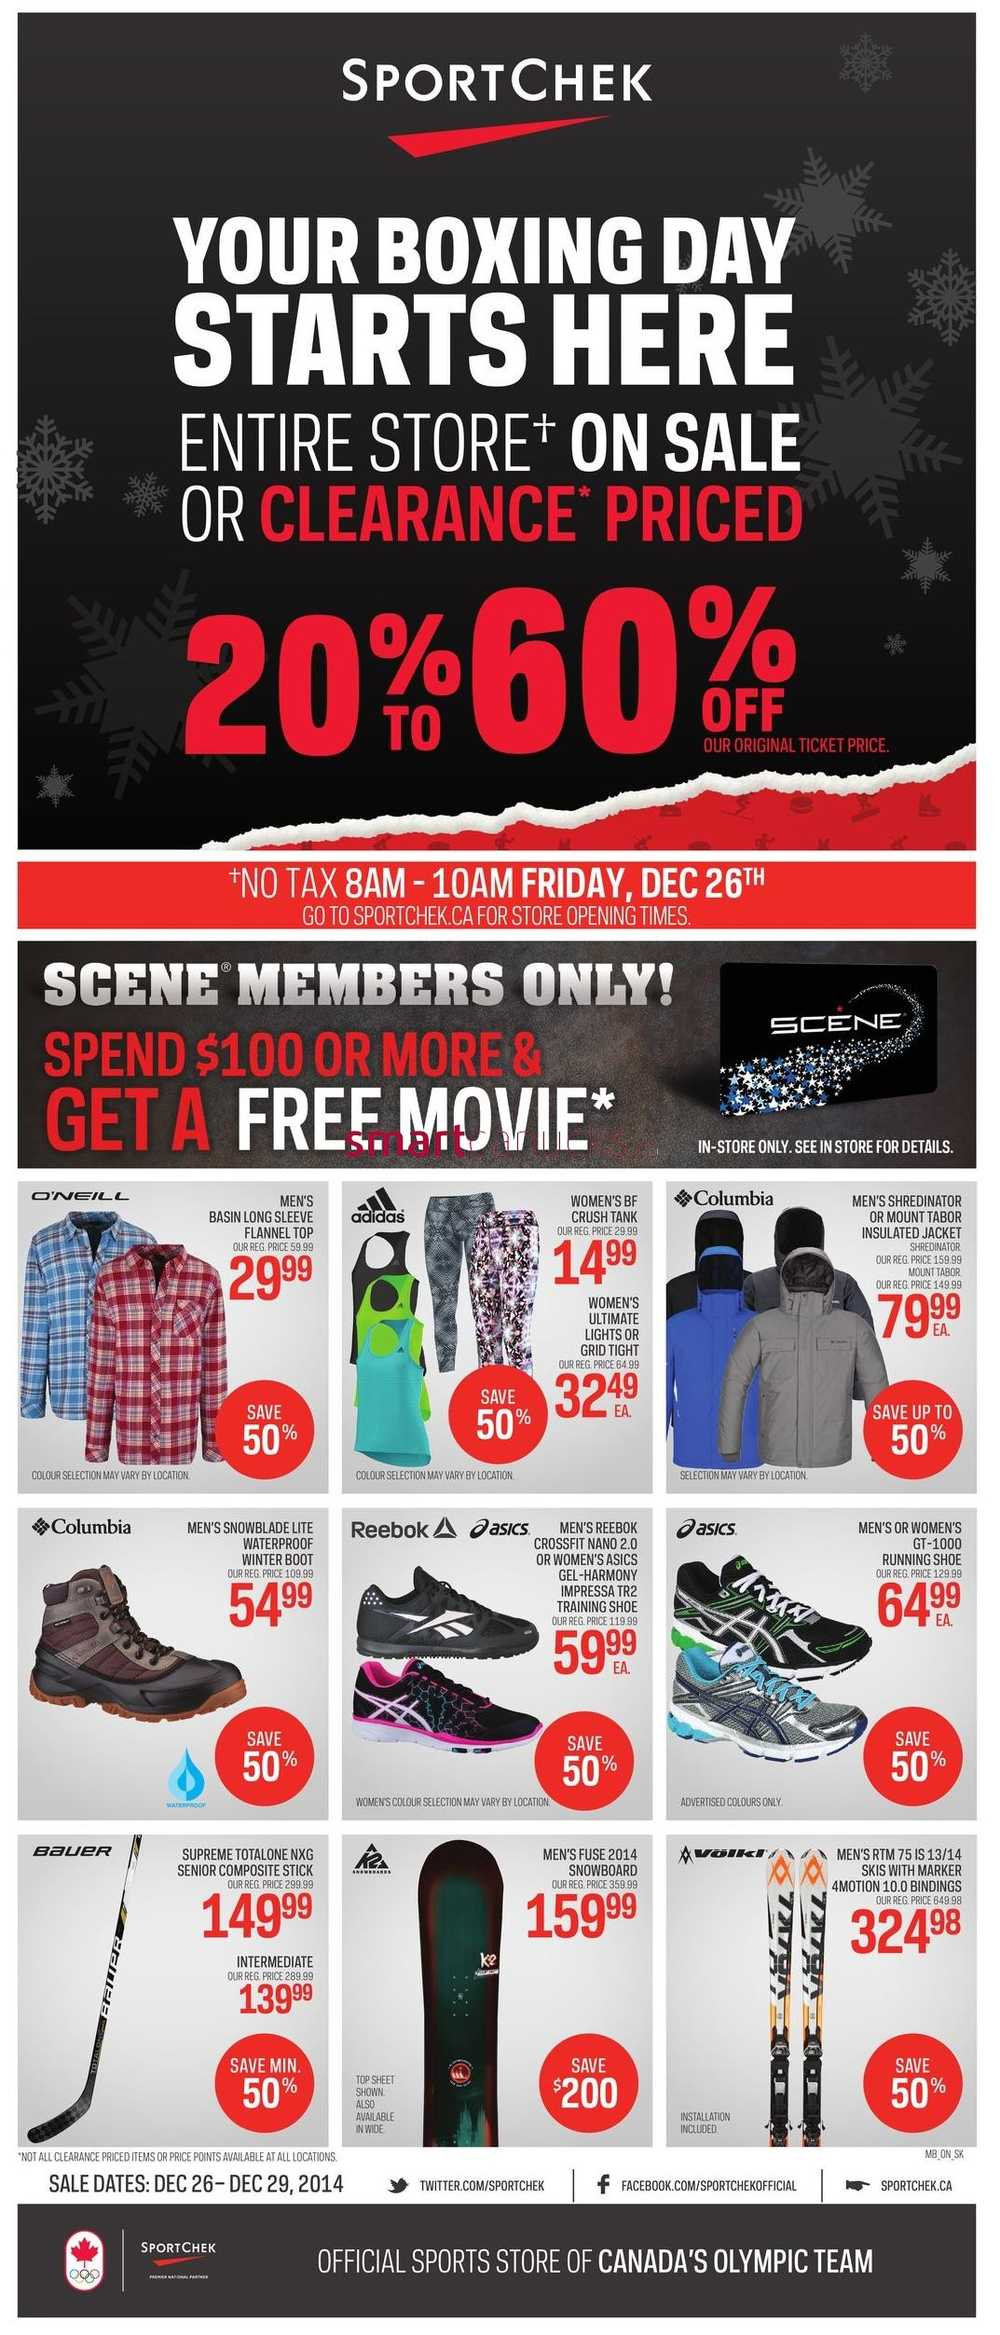 Sport Chek Boxing Day/Week Sale 2014 Flyer